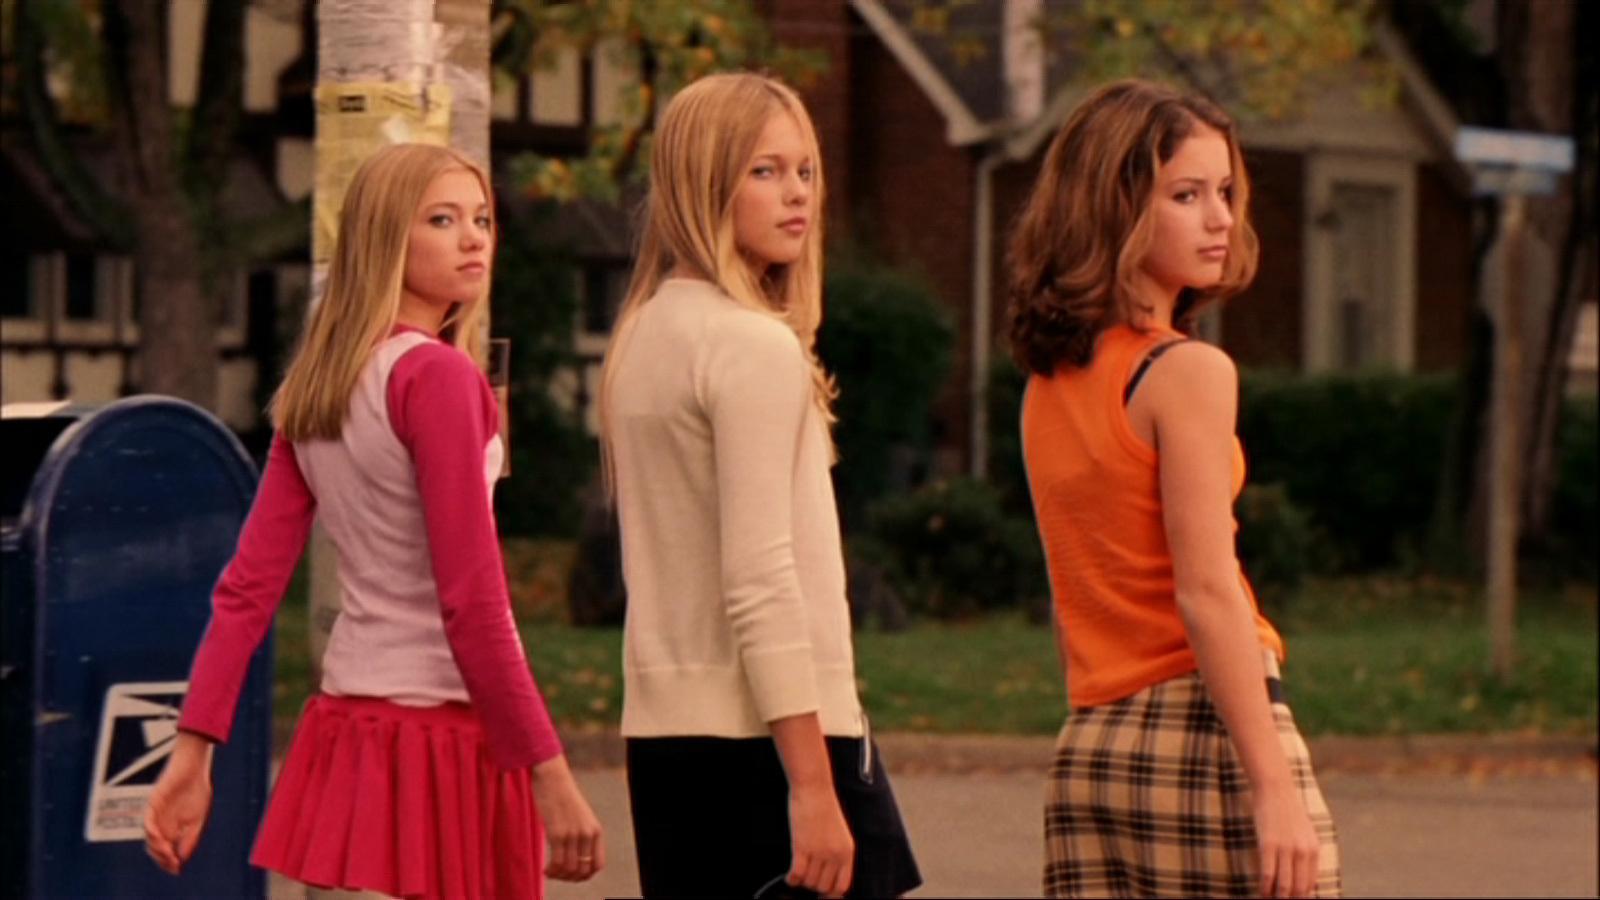 Mean-Girls-screencap-mean-girls-2363541-1600-900 (1).jpg